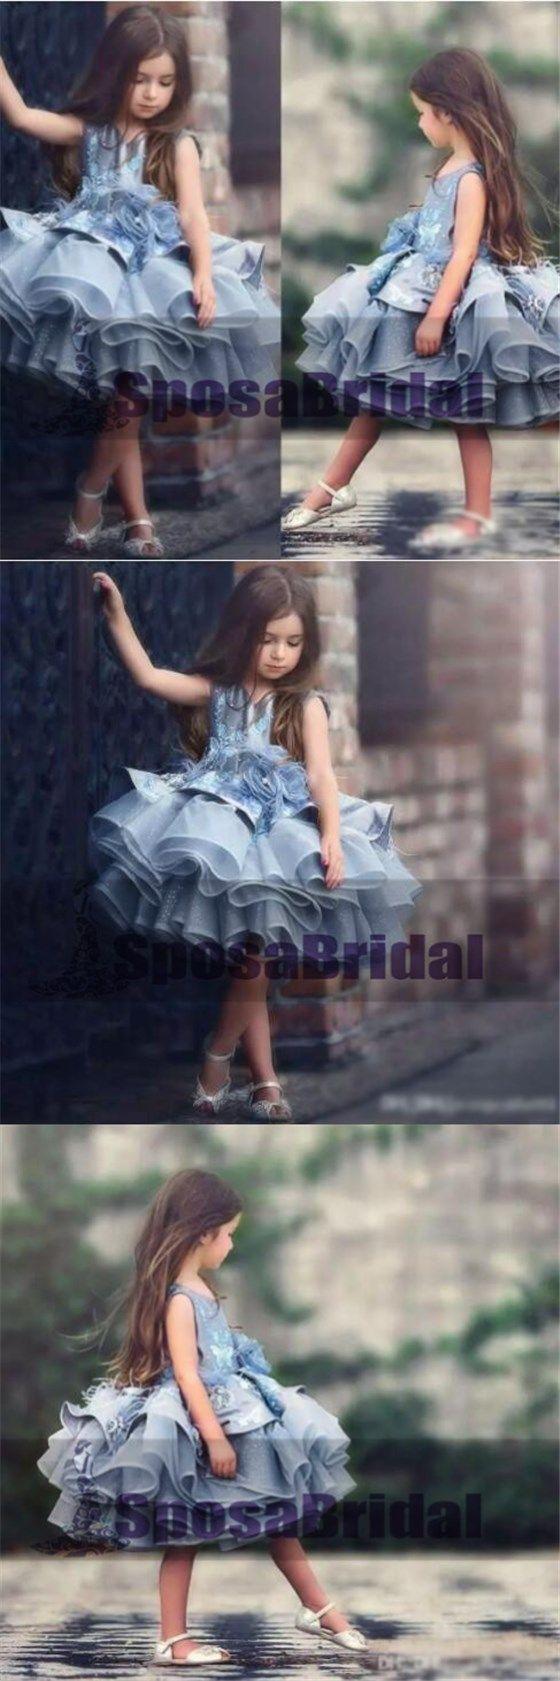 Blue Short Cute Best Sale Soft New Unique Flower Girl Dresses, Popular Little Girl Dresses, FG100